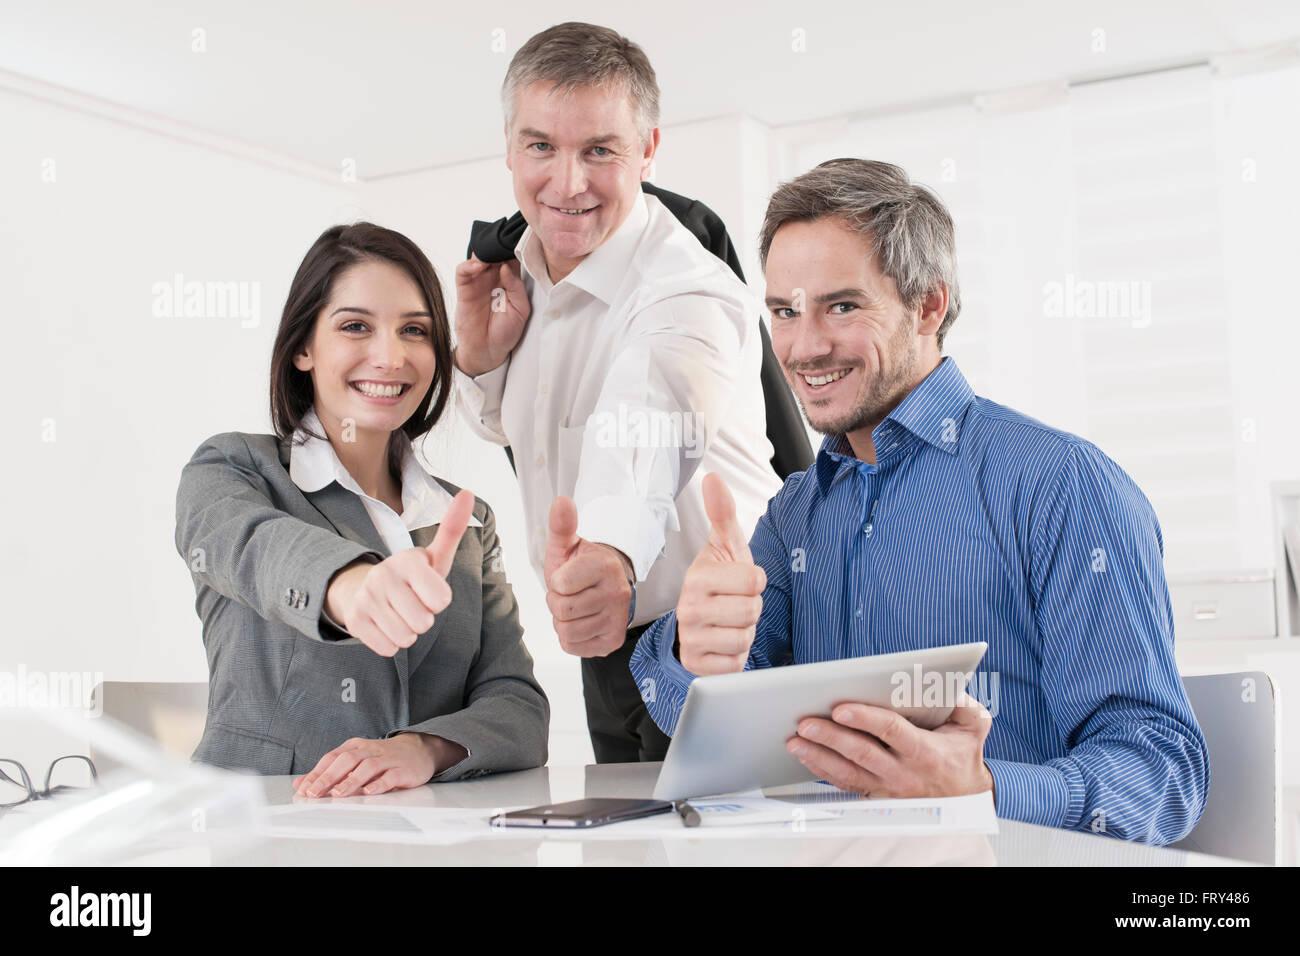 Equipo de oficina de negocios mostrando pulgar arriba Imagen De Stock